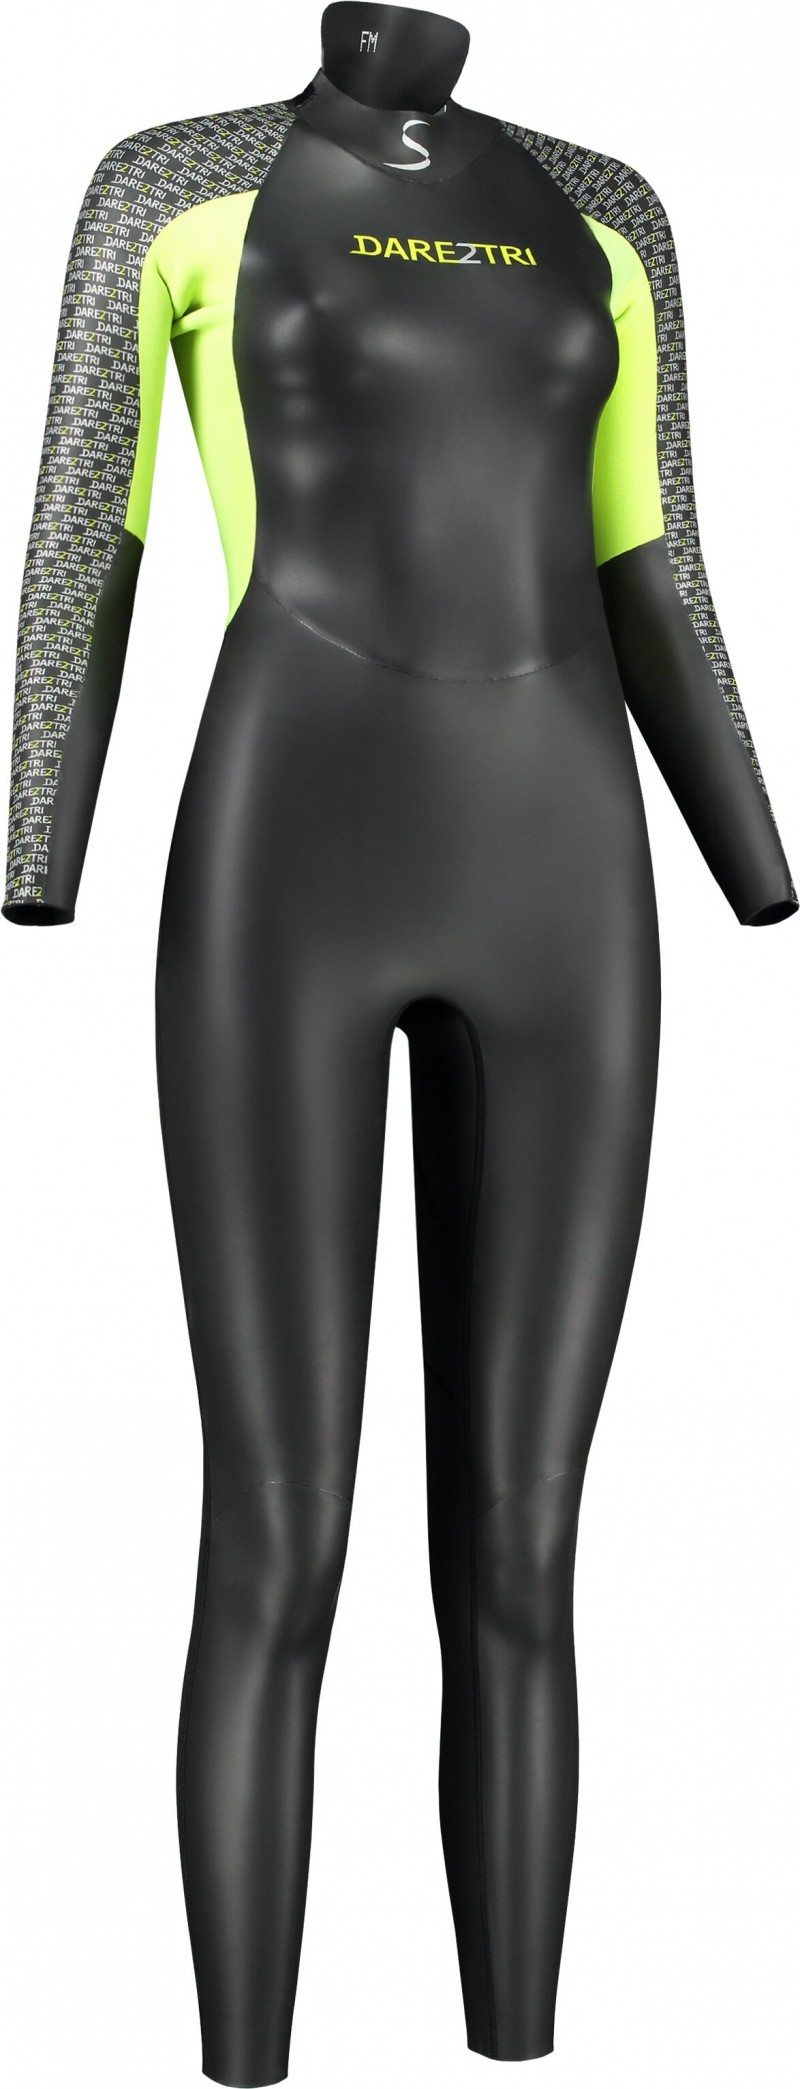 Dare2Tri - To Swim Wetsuit (Size: FXL)